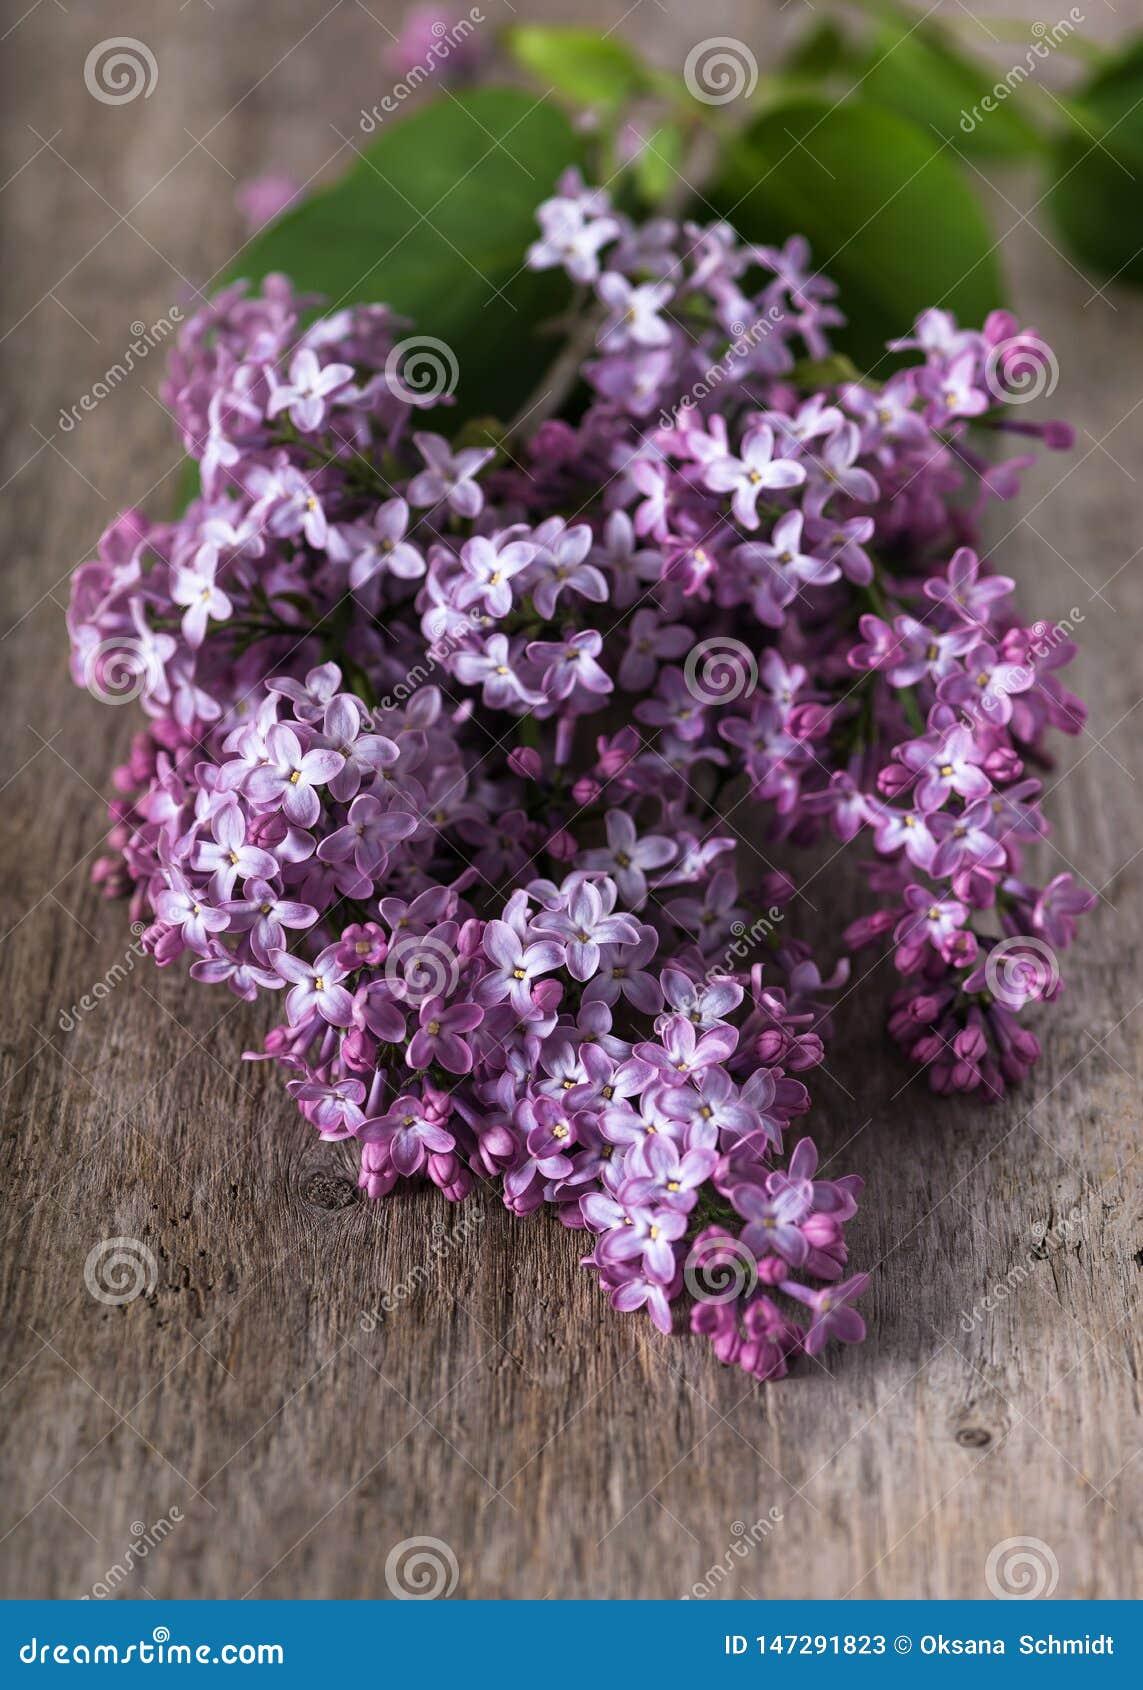 Flores lil?s violetas roxas frescas bonitas